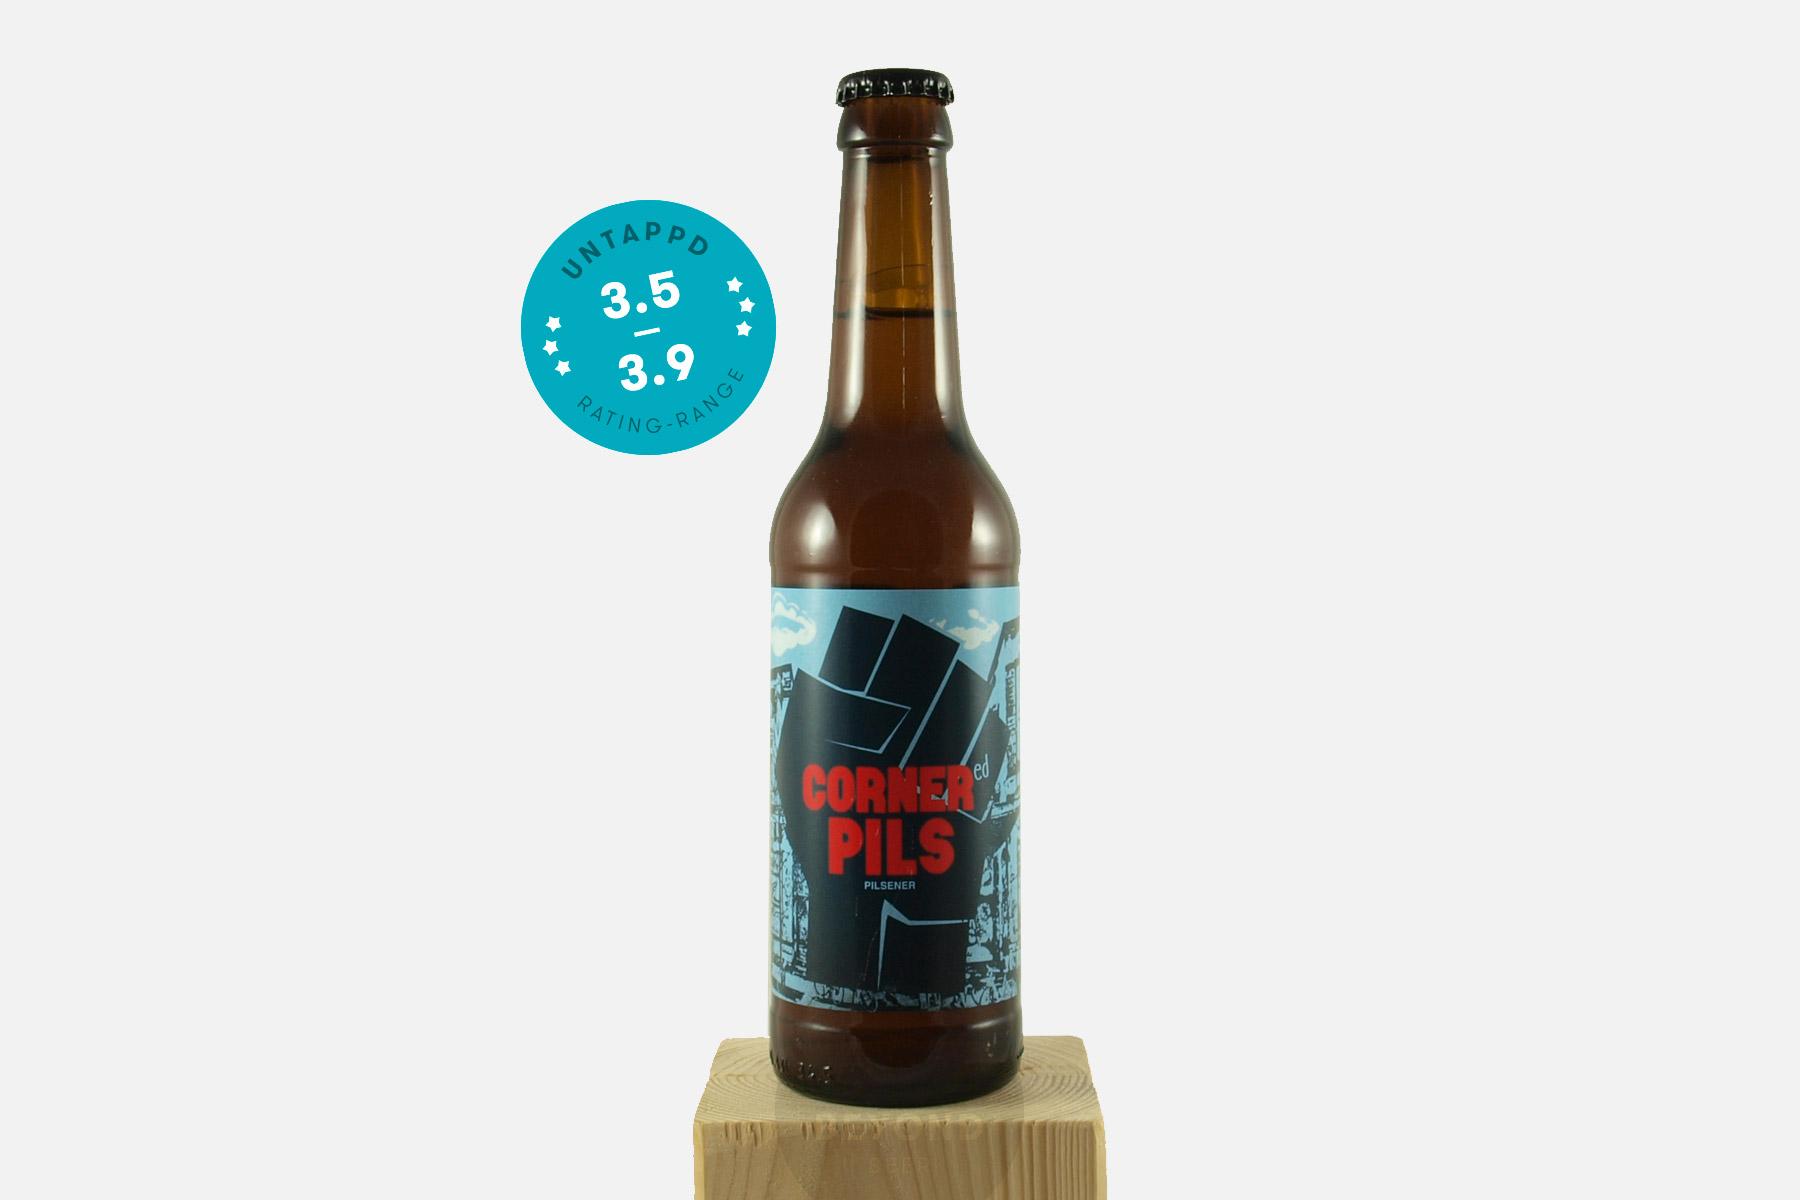 deutsches bier beyond beer. Black Bedroom Furniture Sets. Home Design Ideas